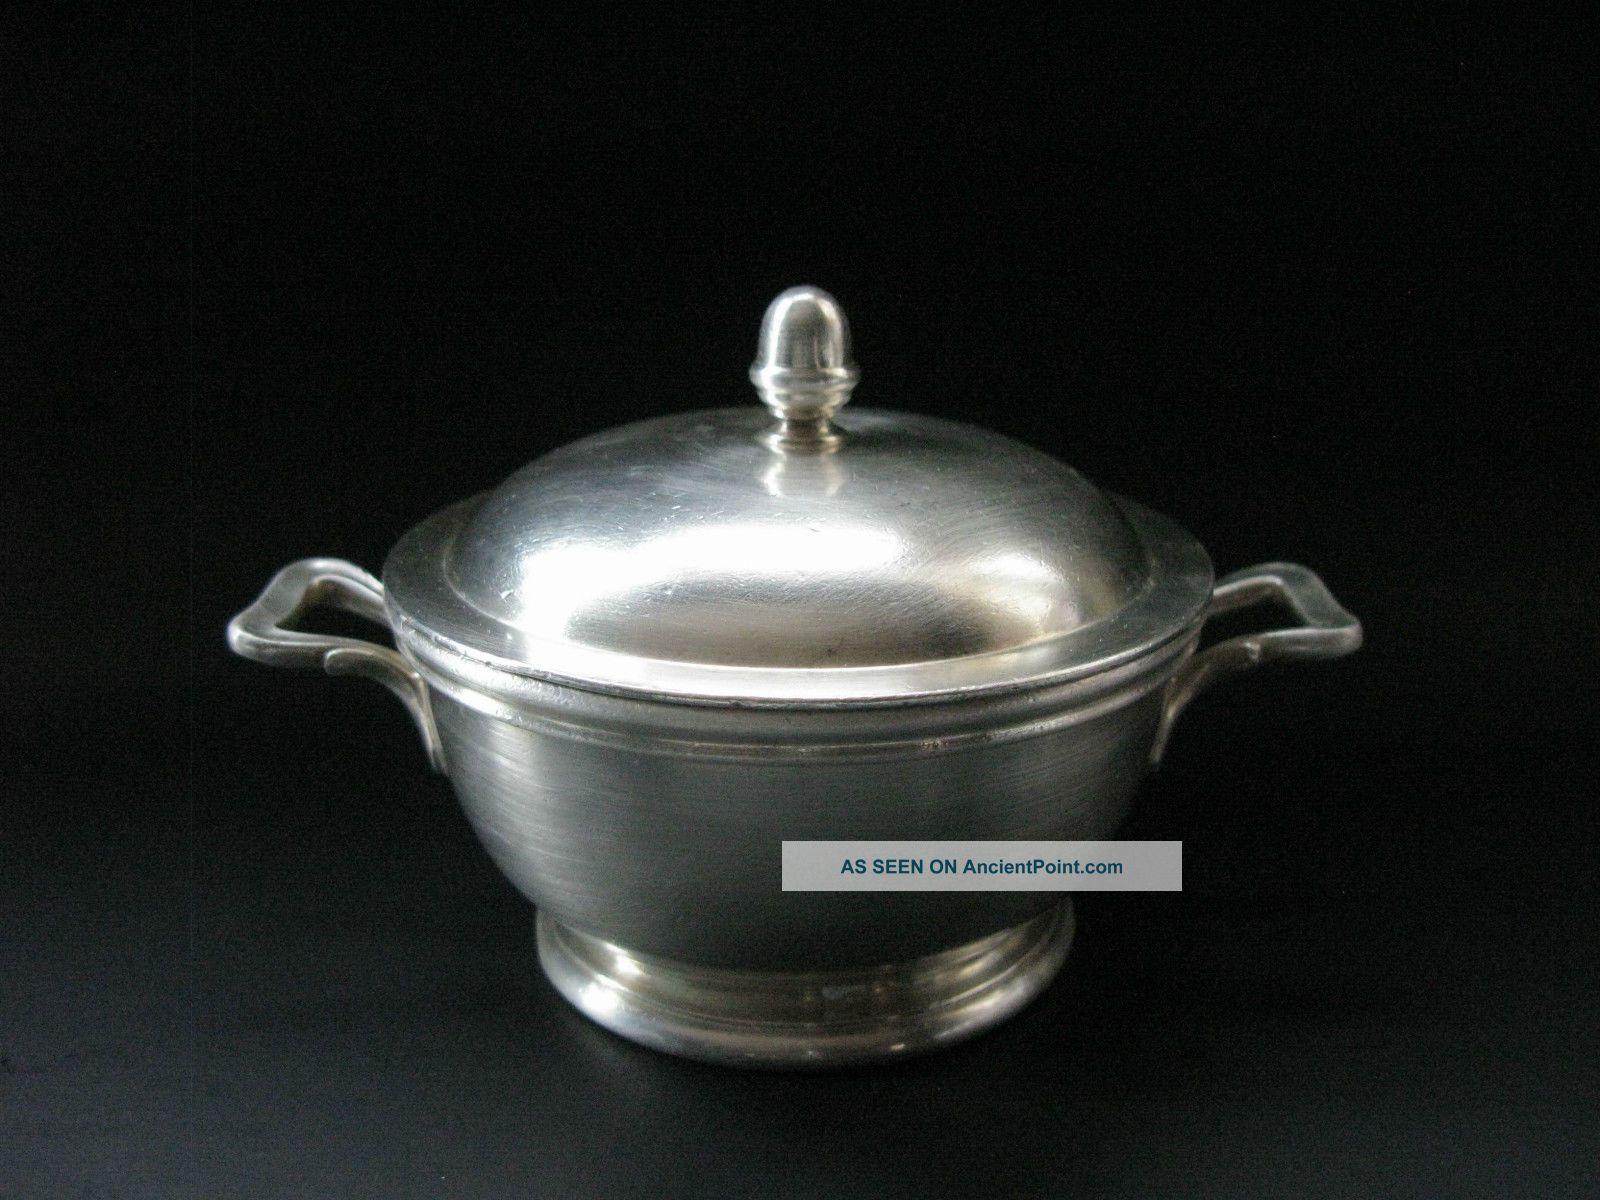 Vintage Reed Barton Silver Soldered Bowl Dish 10oz Ns 7640 Parker House Creamers & Sugar Bowls photo